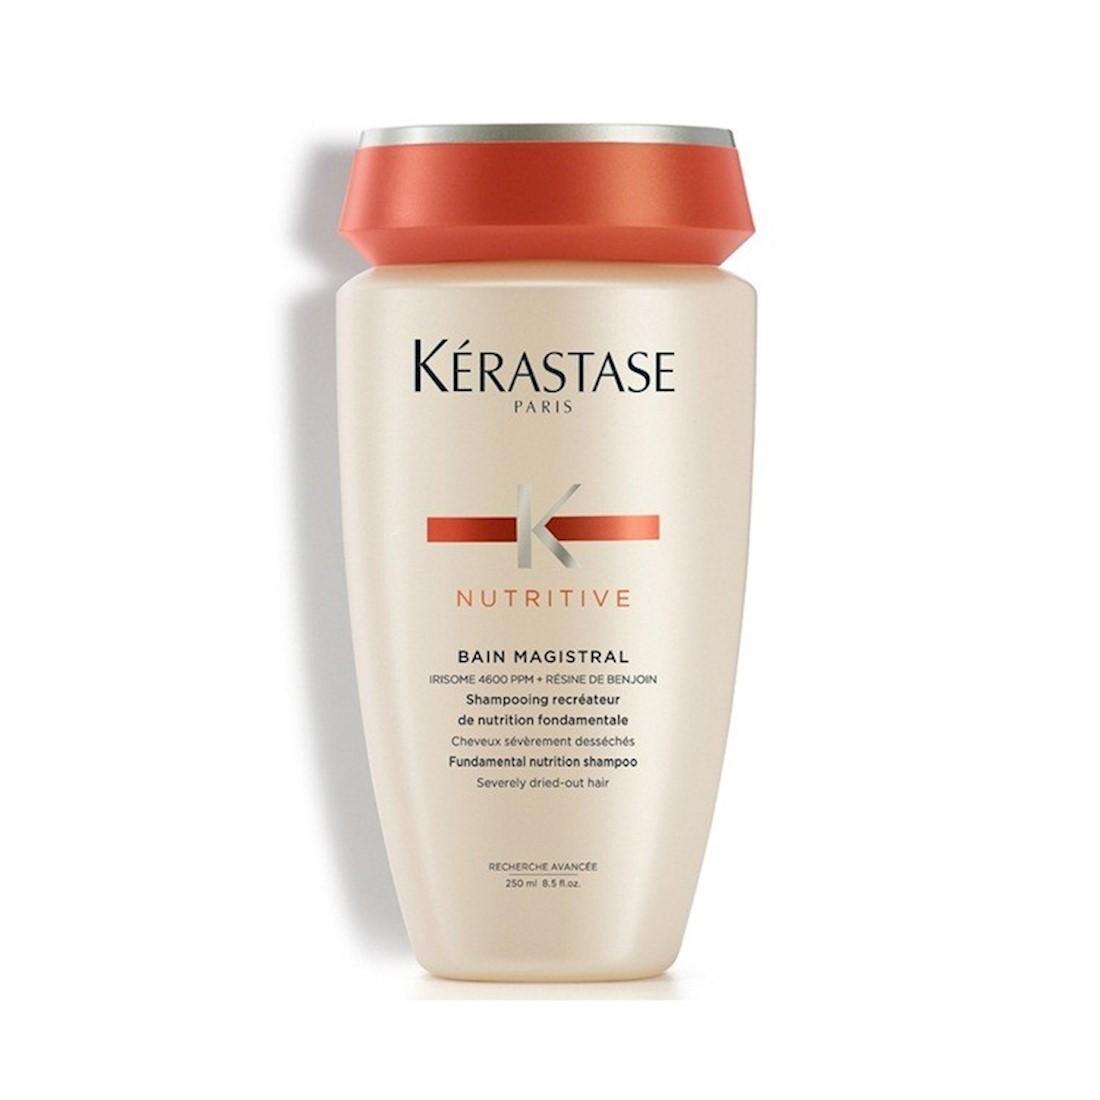 Kérastase Nutritive Bain Magistral - Shampoo 250ml - CA